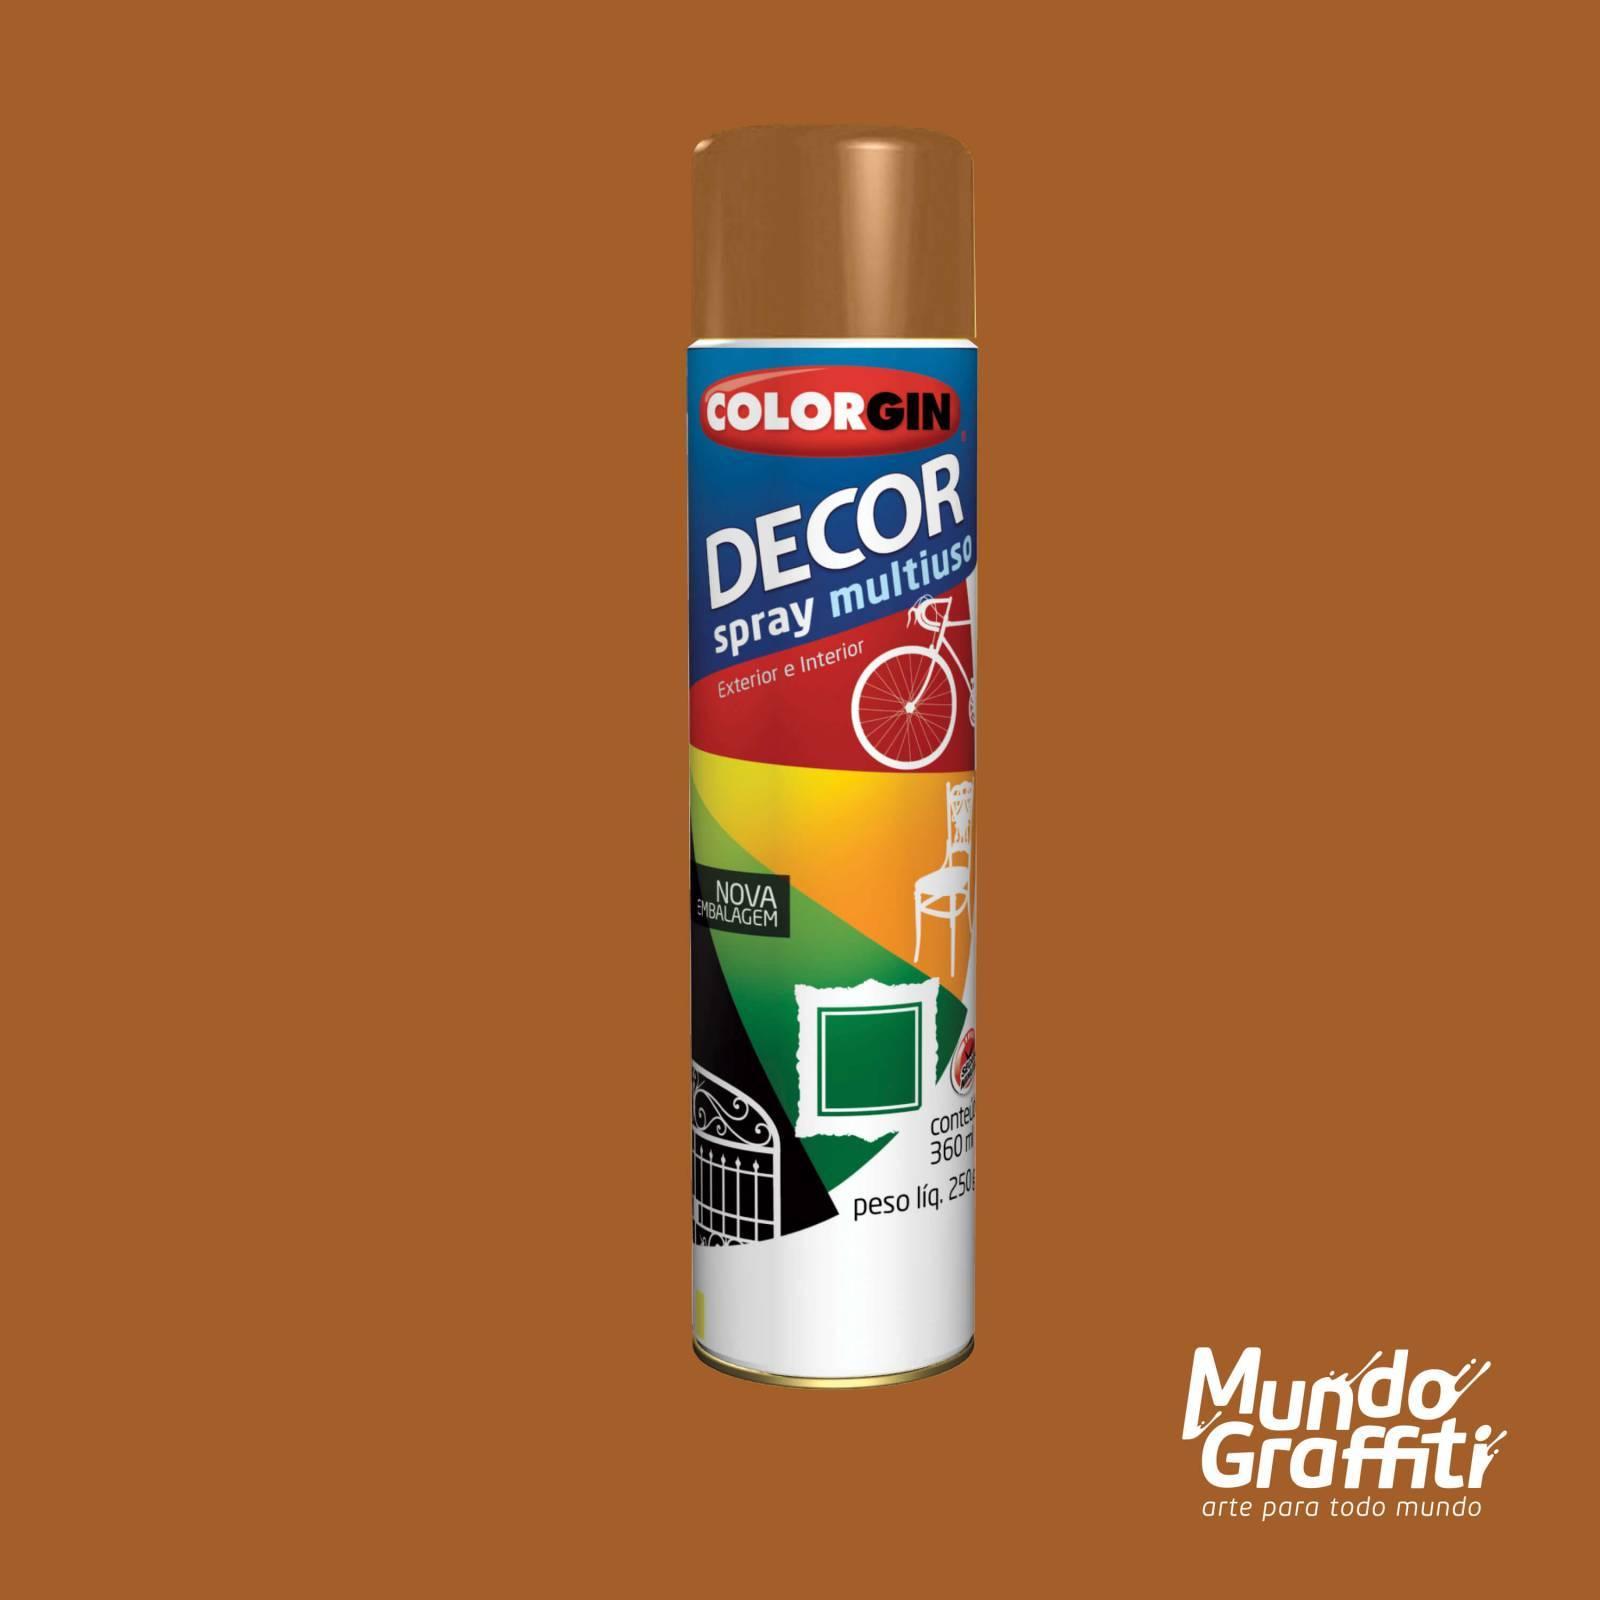 Tinta Spray Colorgin Decor 8671 Marrom Barroco Brilhante 360 - Mundo Graffiti